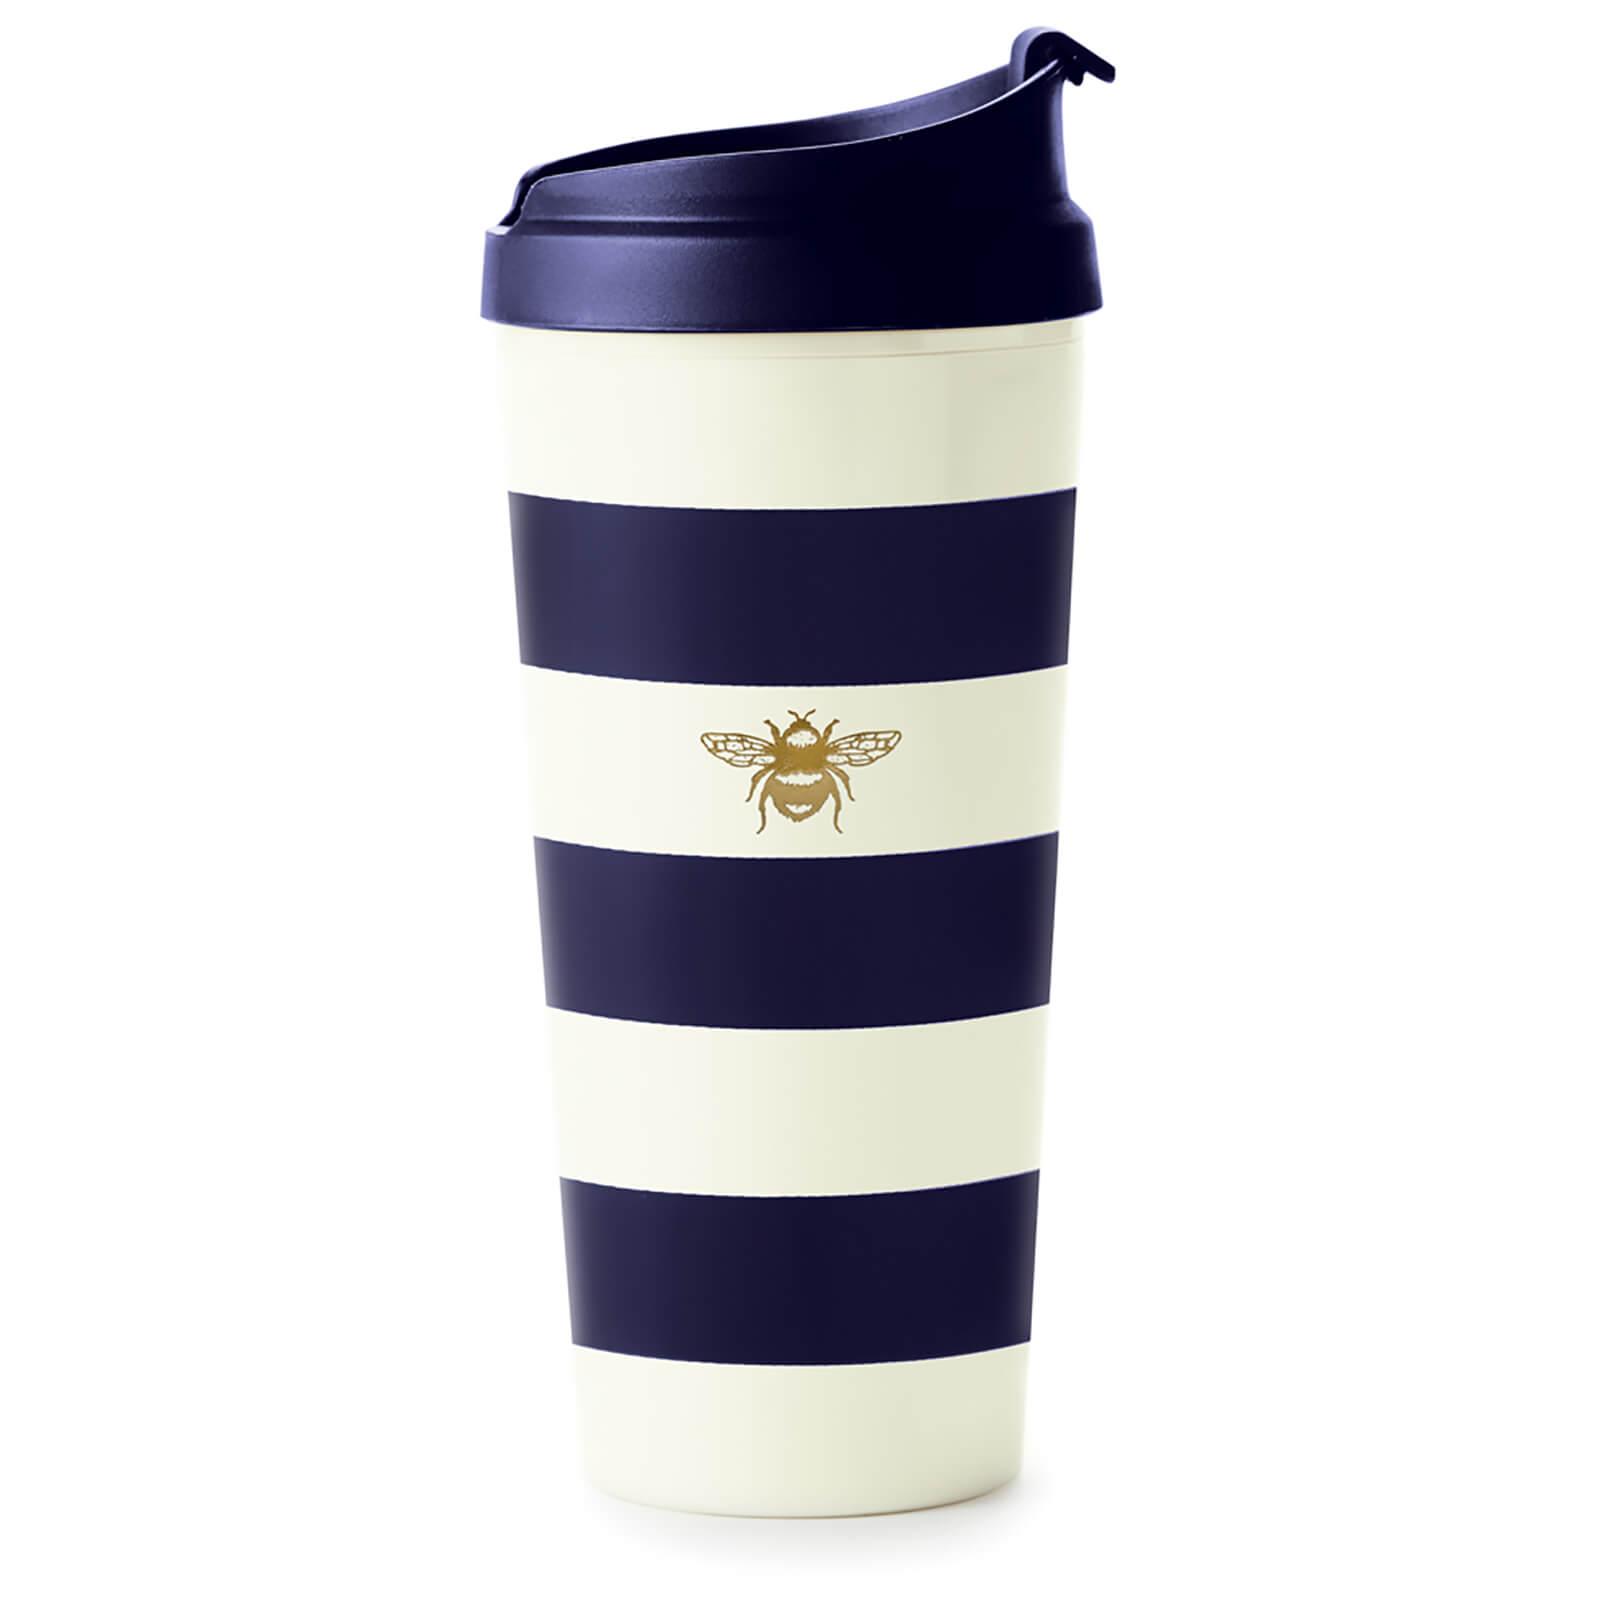 Kate Spade New York Kate Spade Thermal Mug - Navy Stripe With Bee